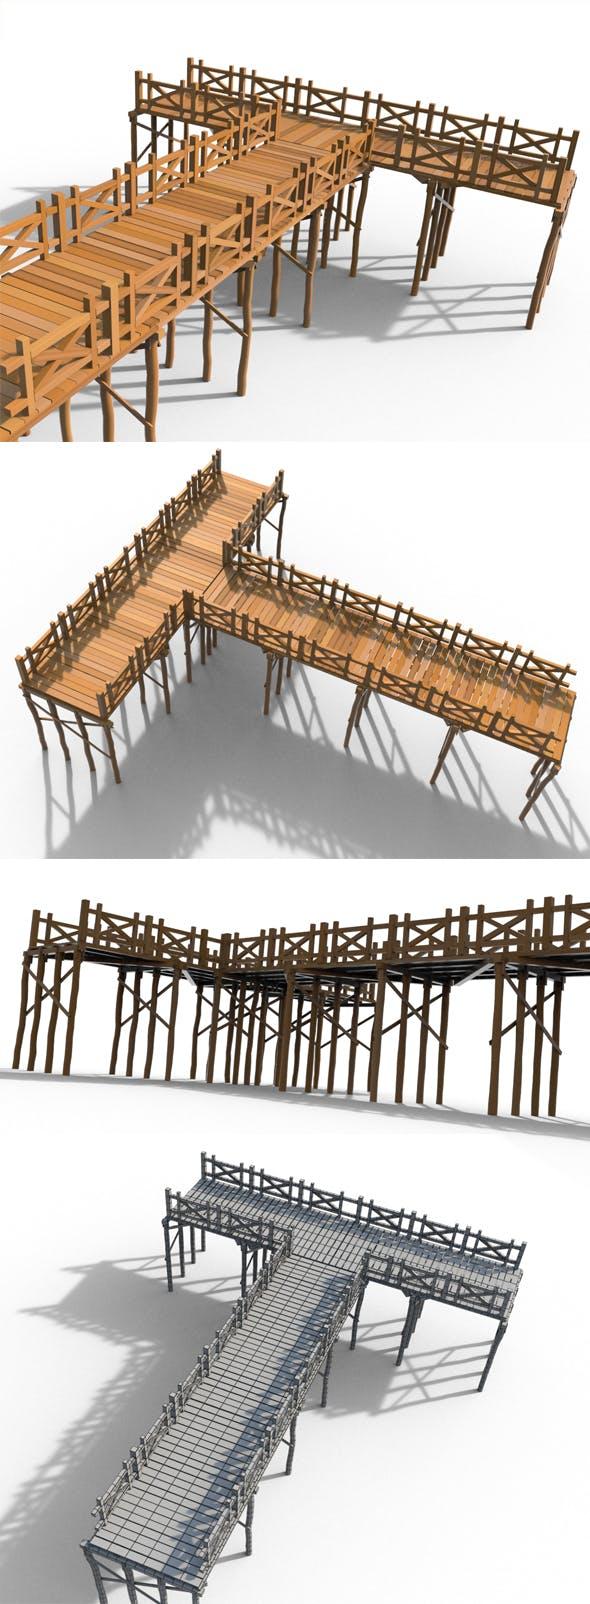 Wooden Pier - 3DOcean Item for Sale